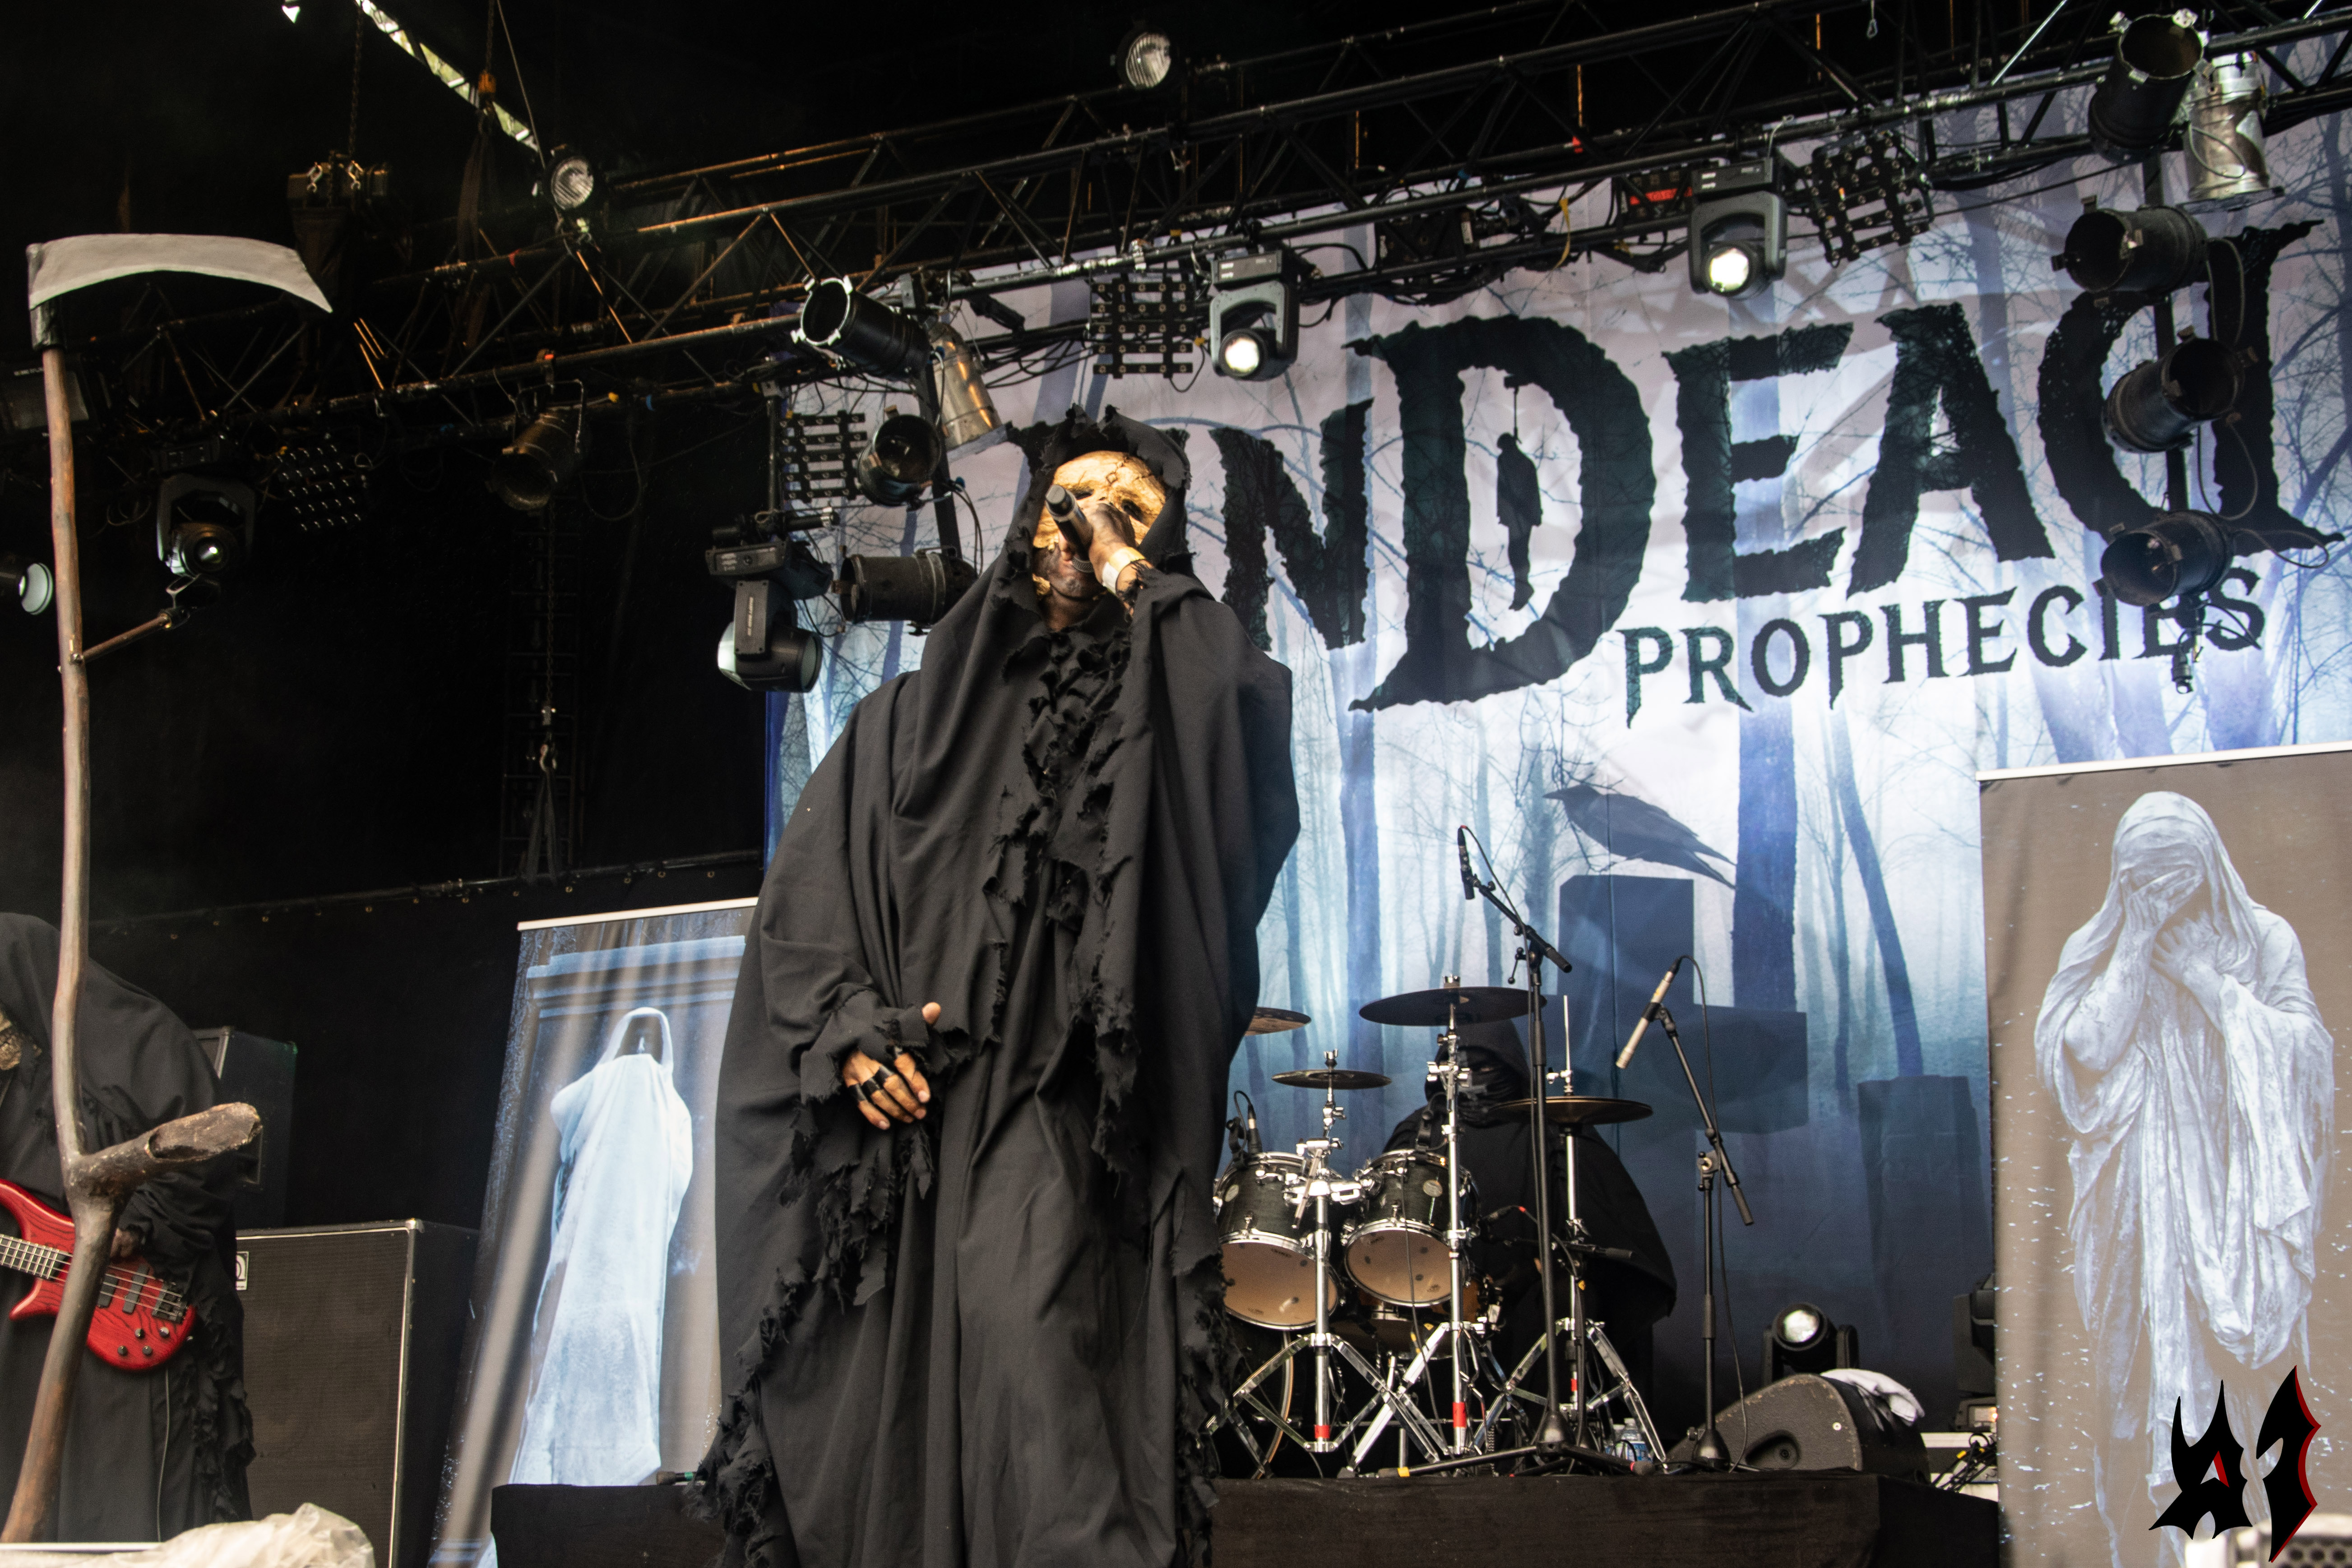 Motocultor - Undead Prophecies - 8